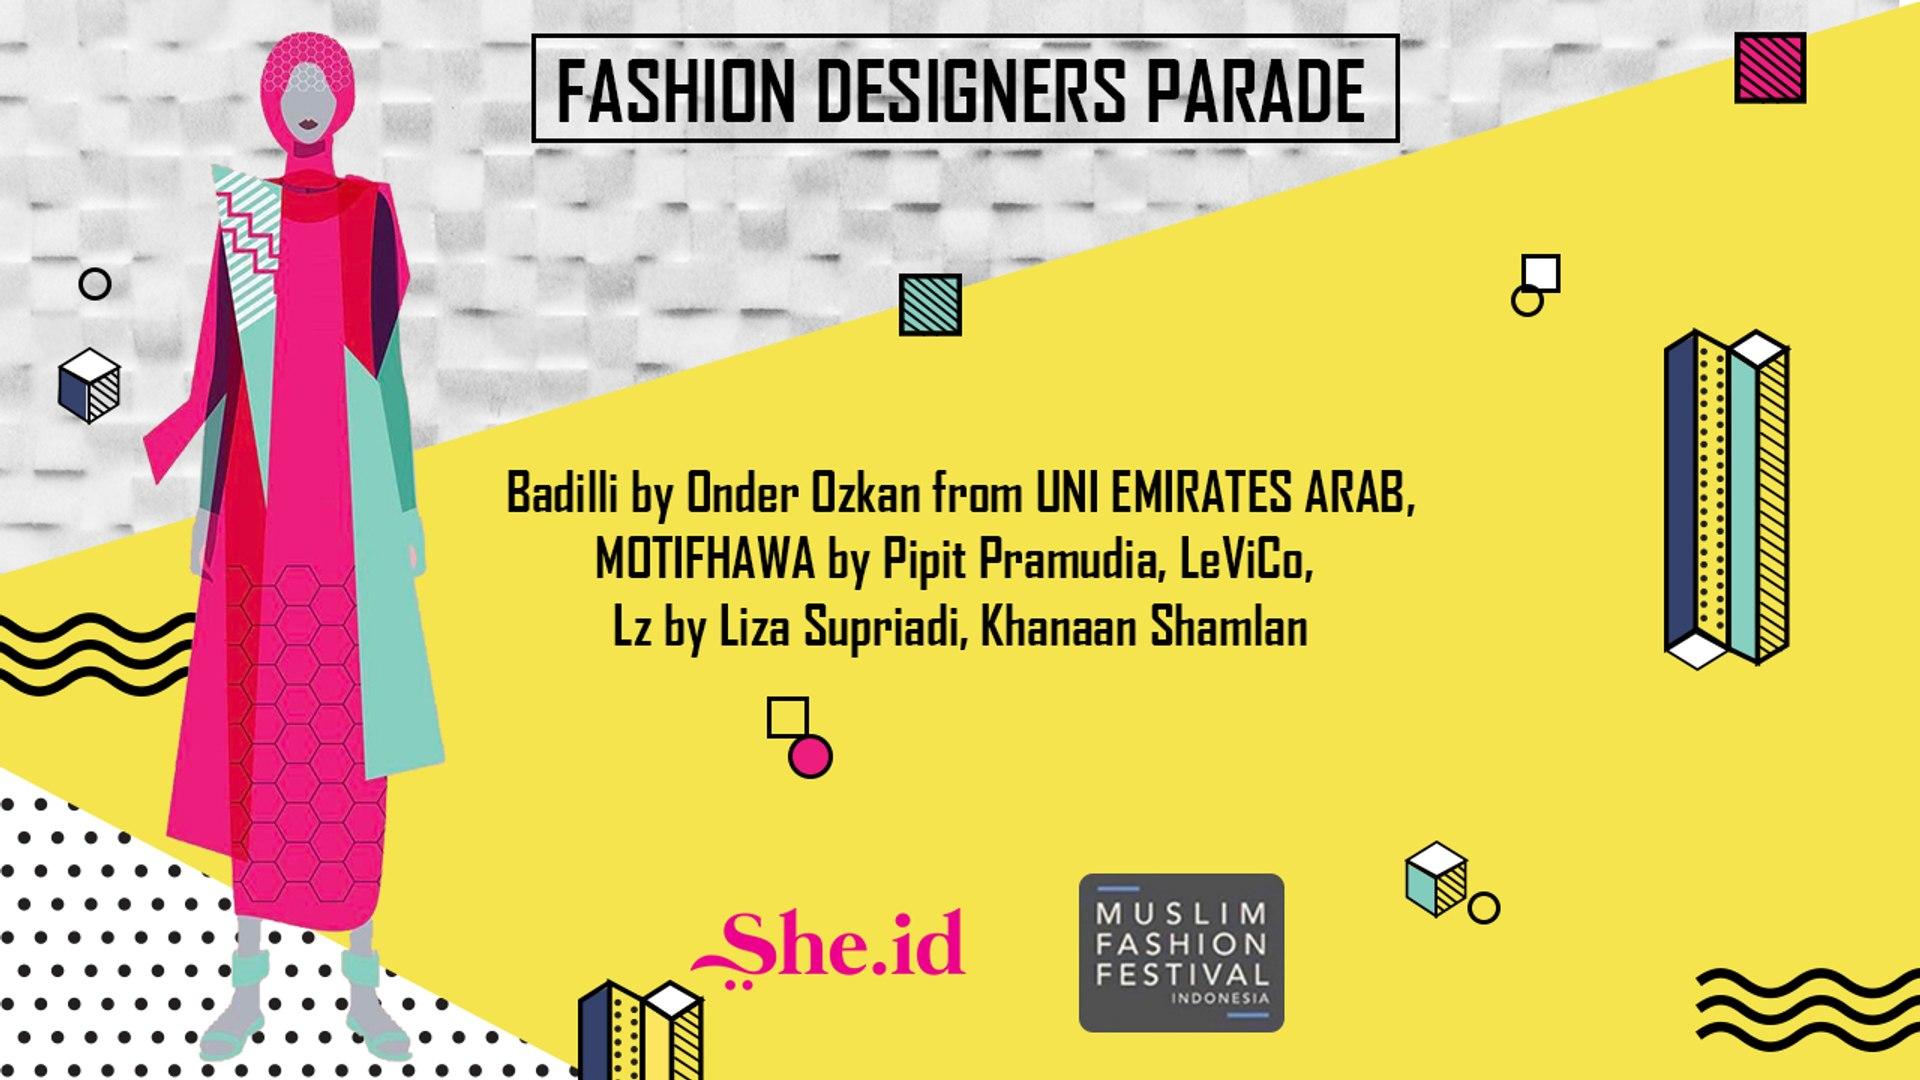 Fashion Designers Parade - Muslim Fashion Festival